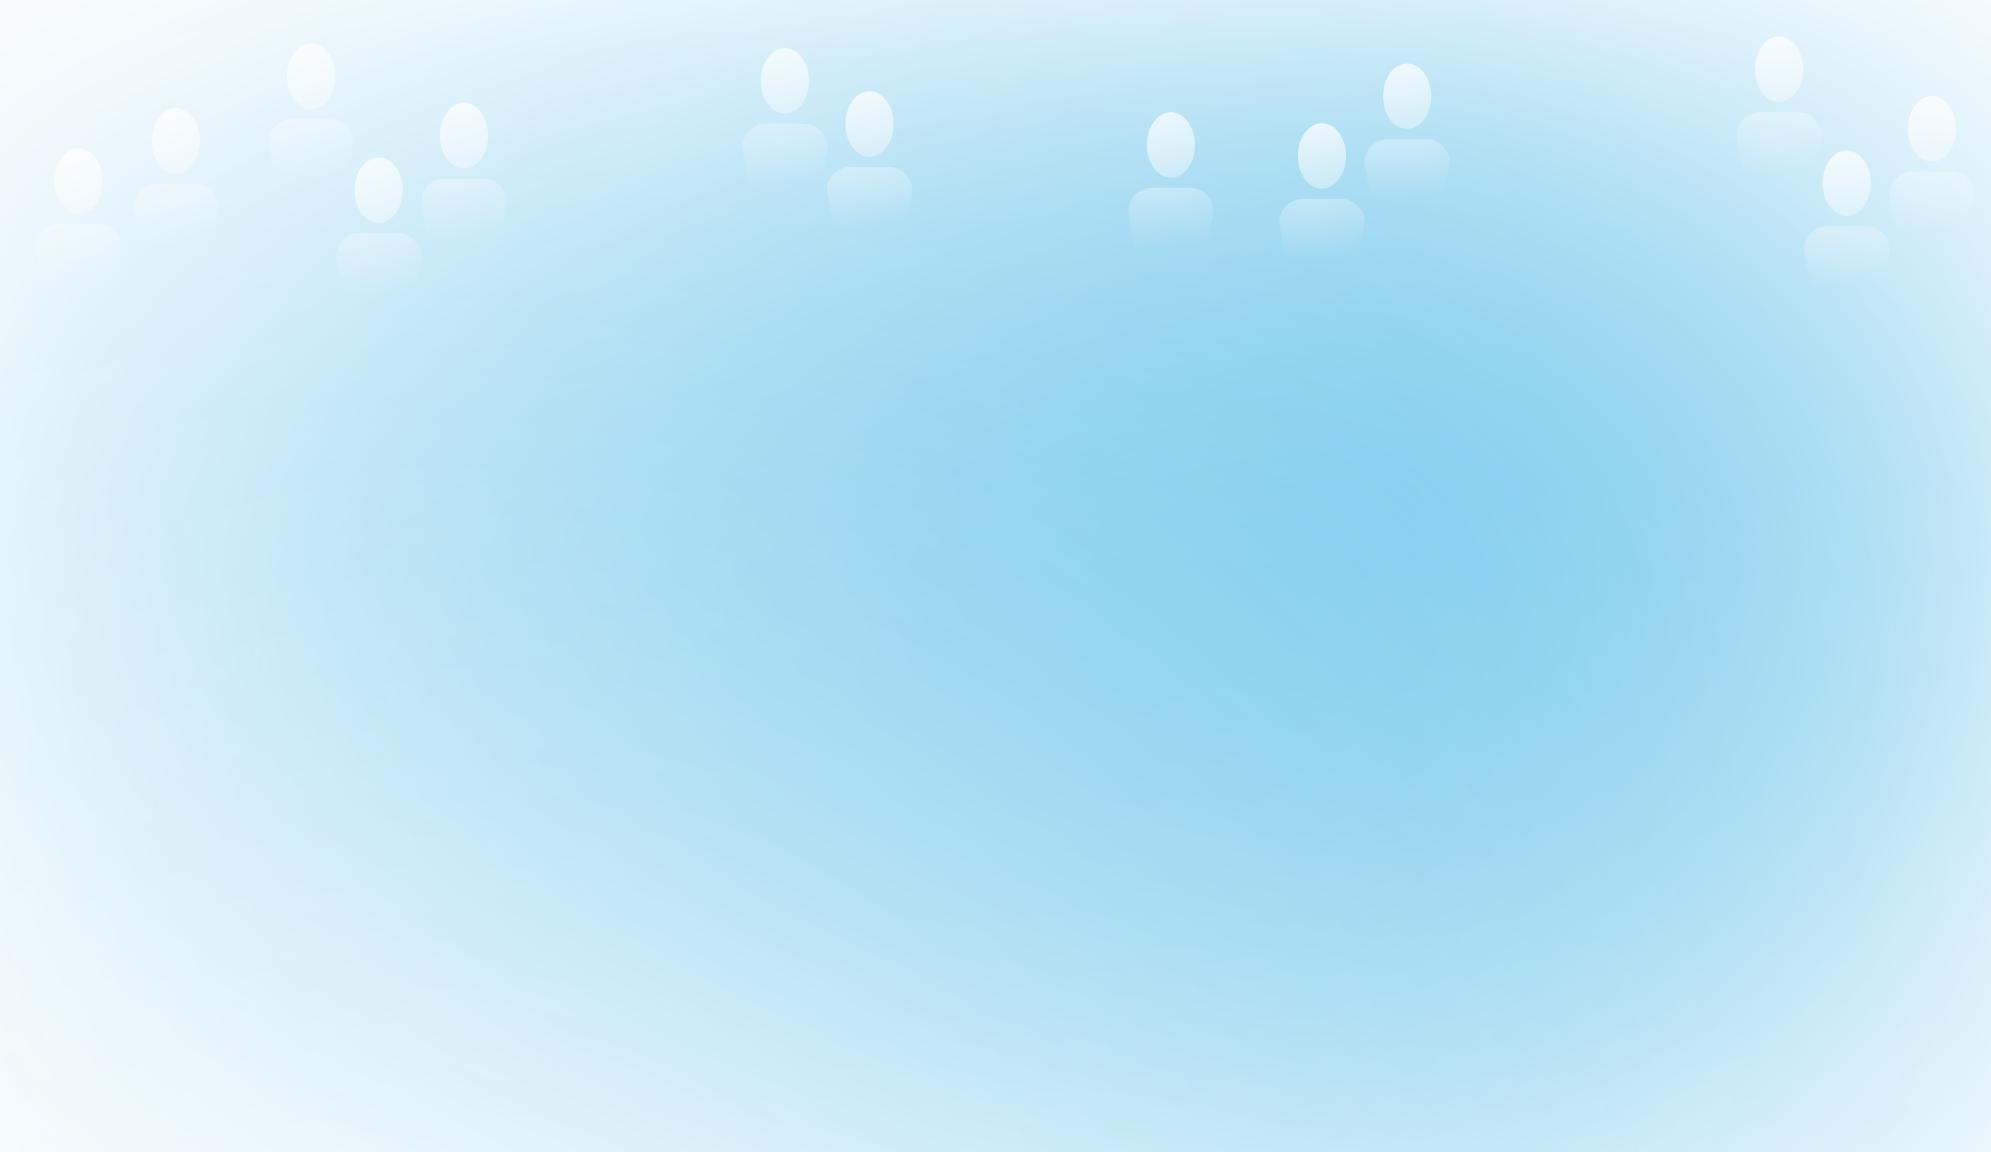 Blur Background Frost Blue People Rachel Alexandria